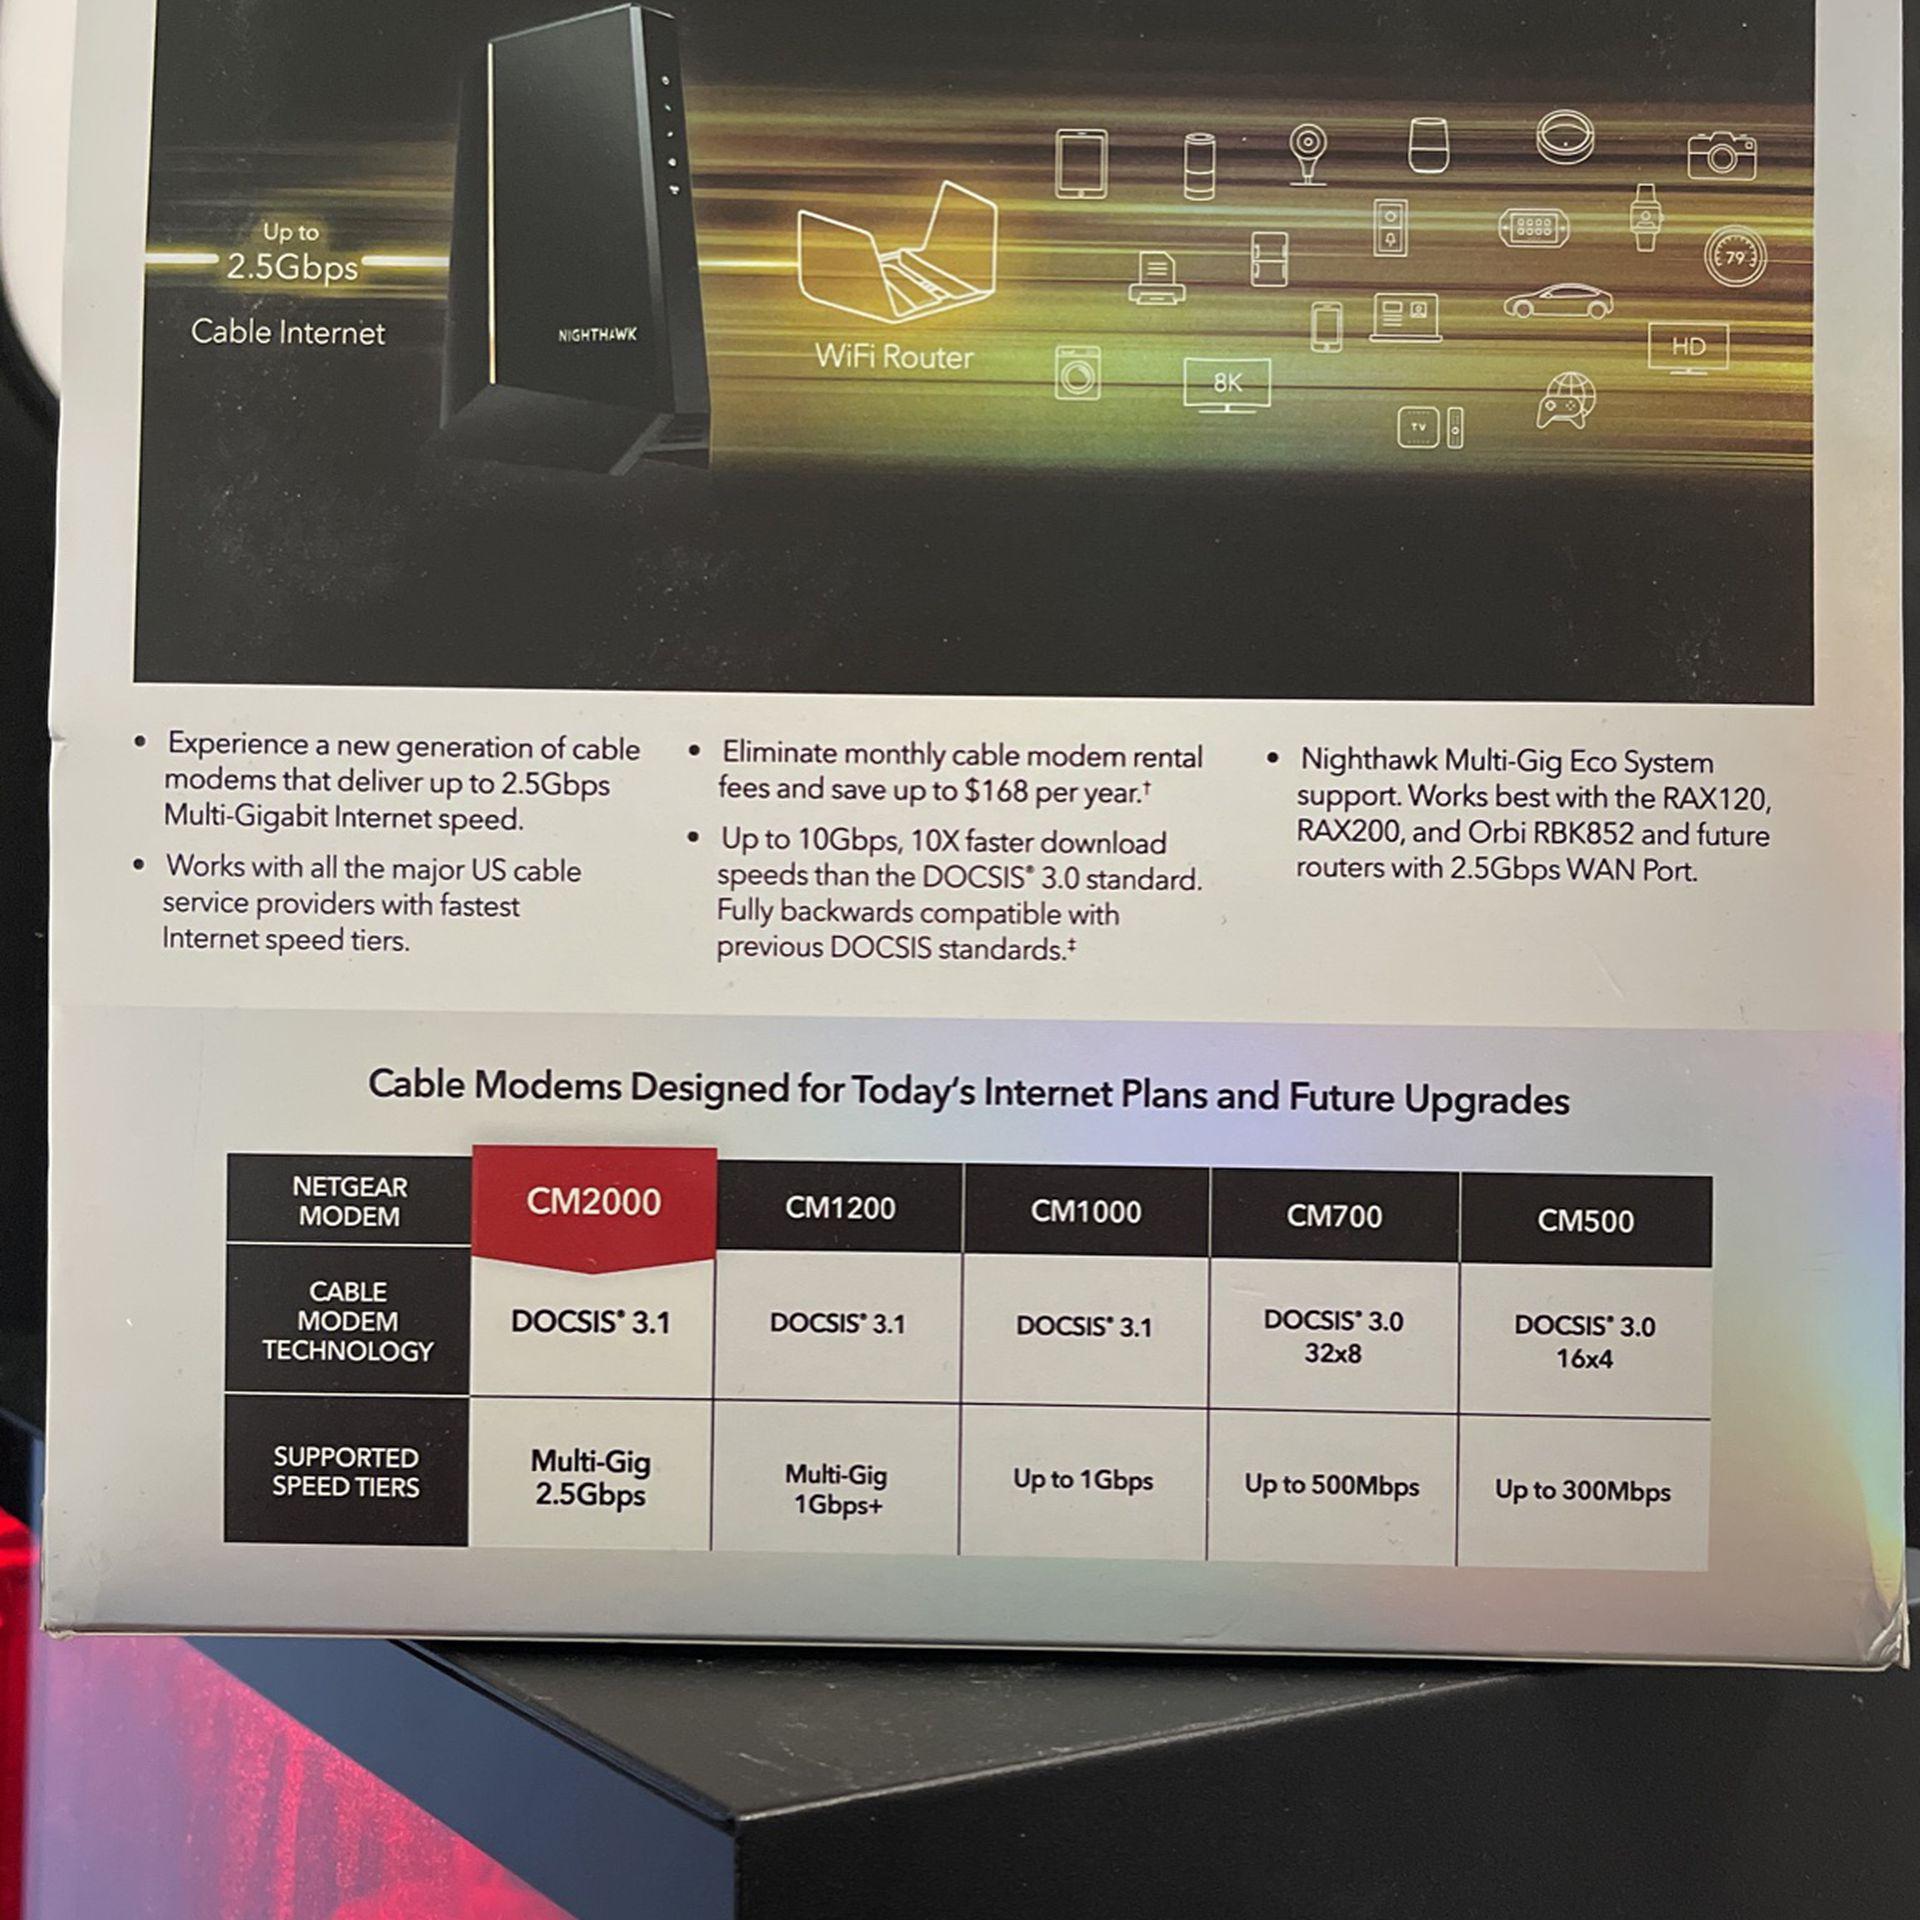 Netgear Nighthawk CM2000 DOCSIS 3.1 Cable Modem